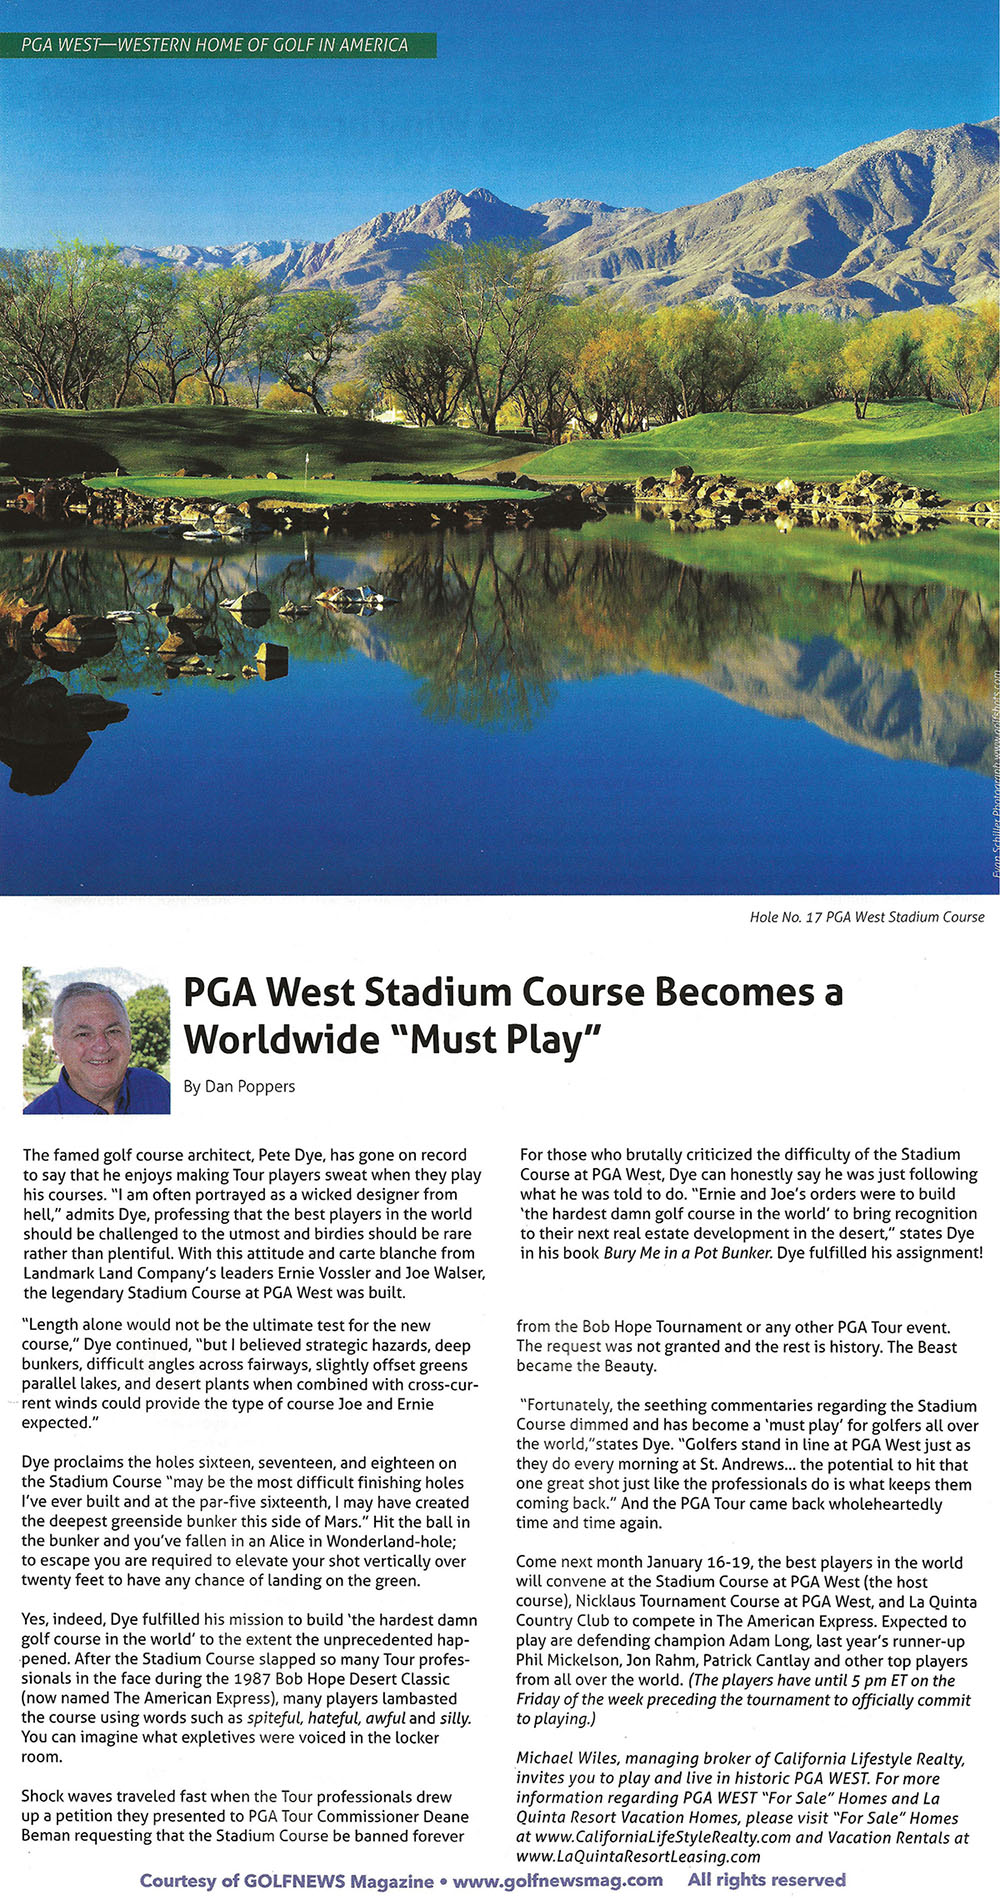 PGA WEST_California Lifestyle Realty